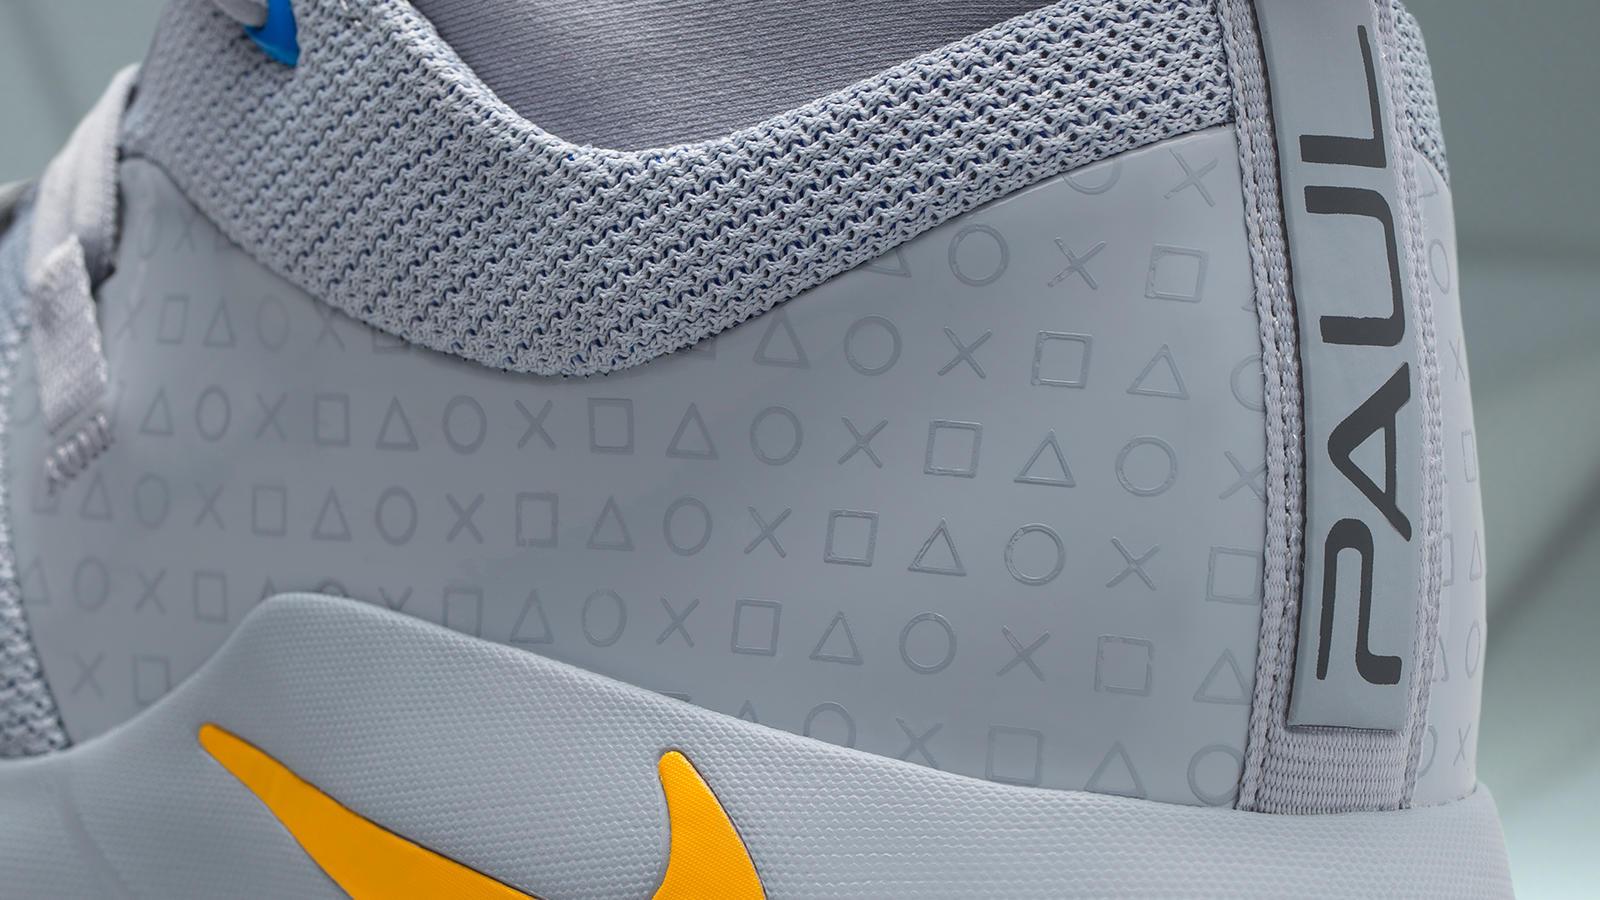 f24e1025e906 这双Nike PG 2.5 x PlayStation,Nike篮球设计师将标志性的PlayStation符号应用于该鞋款的侧面。与PG2不同的是,这双鞋运用了代表着初代游戏机的灰色并搭配舌鞋部位  ...